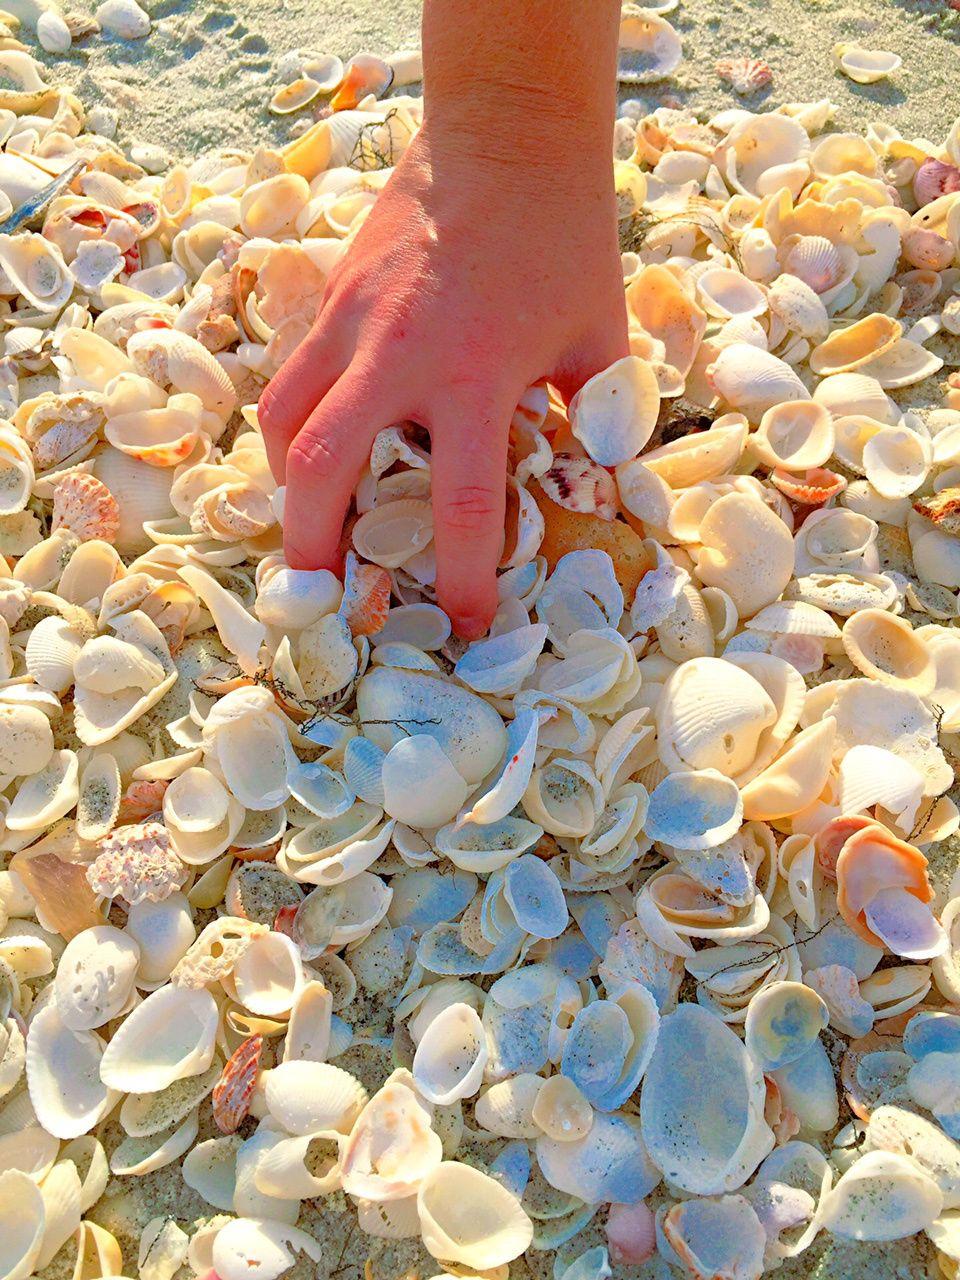 Shell hunting on sanibel island where how to collect shells places to collect shells on sanibel island florida nvjuhfo Gallery